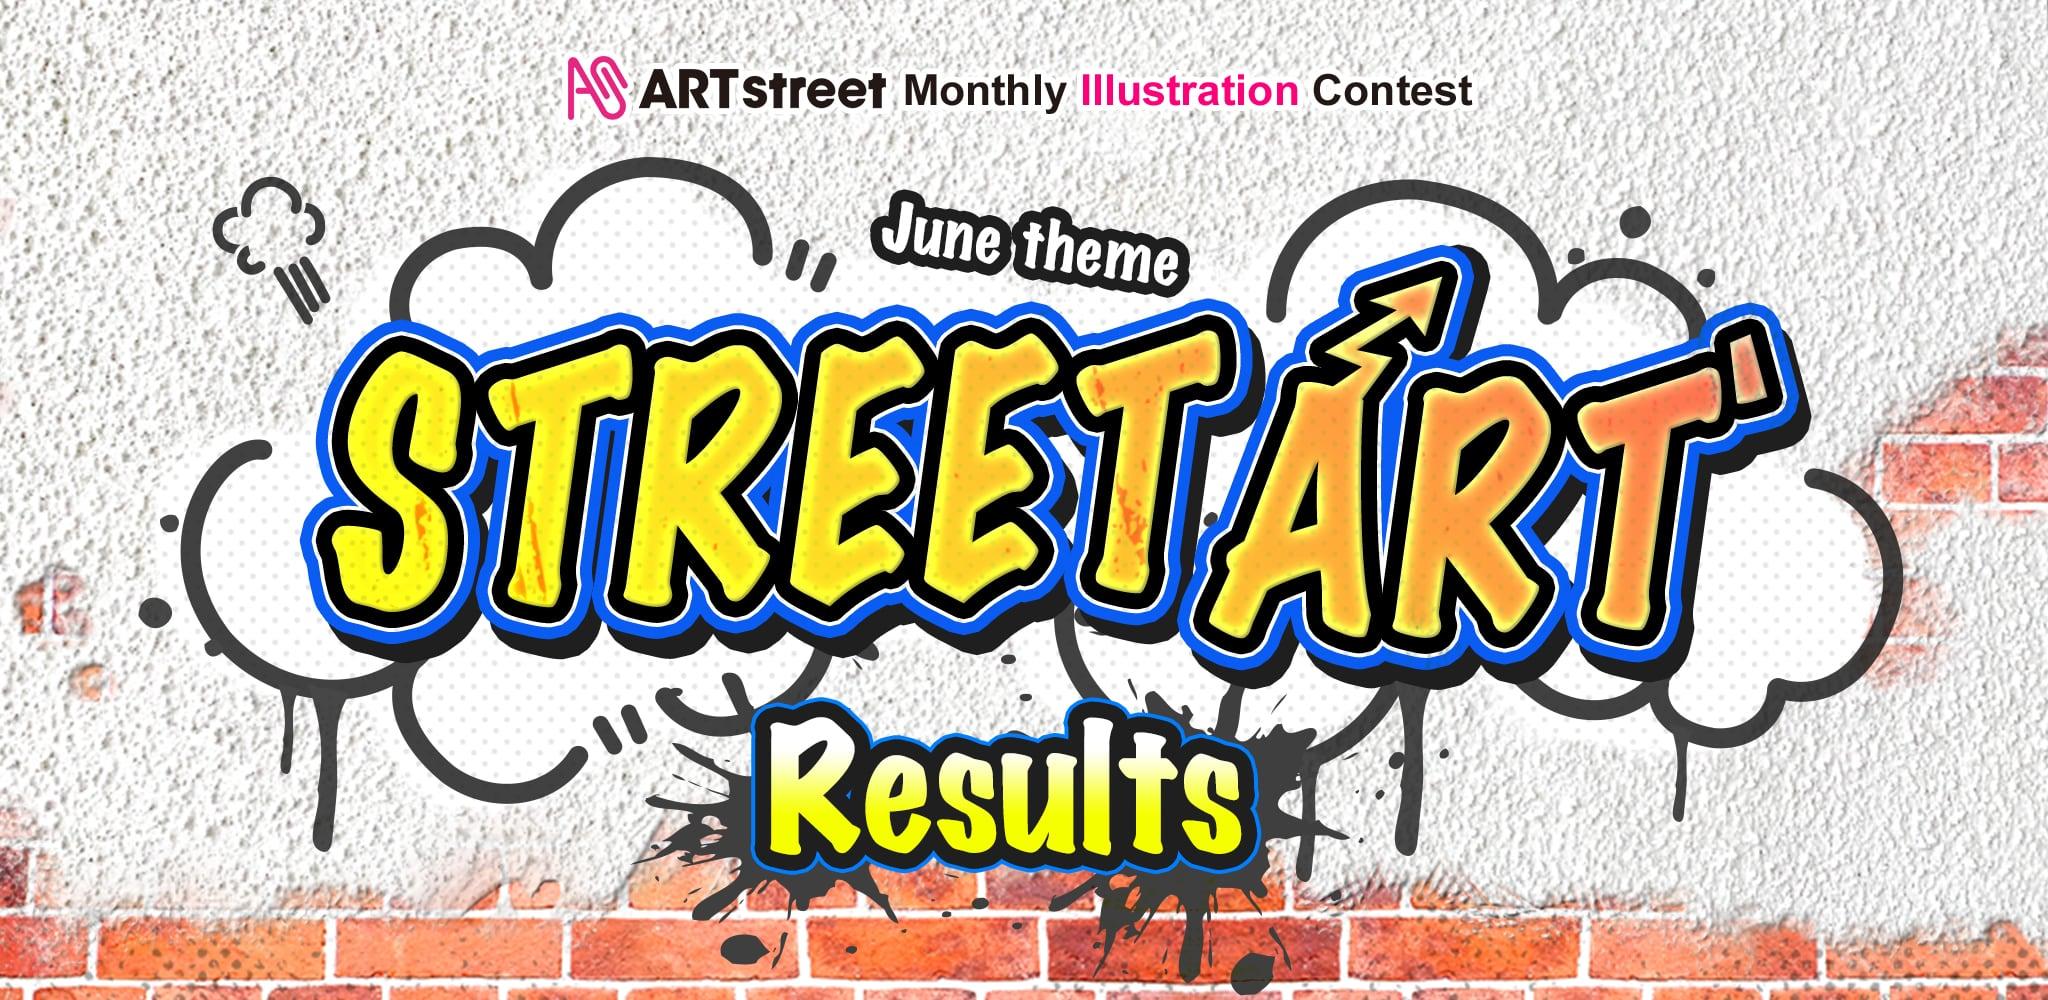 ART street Monthly Illustration Contest June Theme: Street art Results | Contest - ART street by MediBang